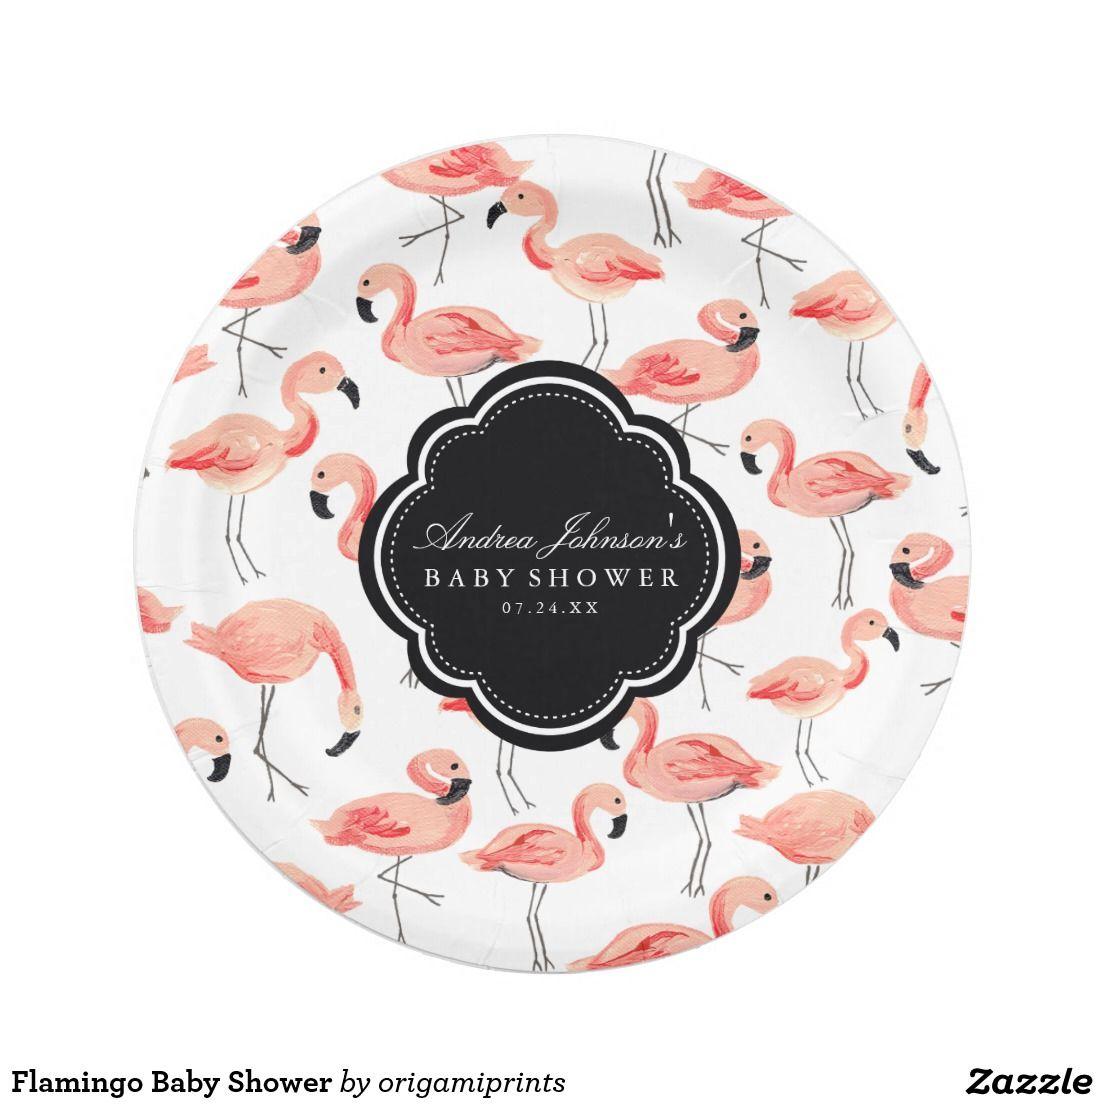 Flamingo Baby Shower Paper Plate  sc 1 st  Pinterest & Flamingo Baby Shower Paper Plate | Flamingo baby shower Flamingo ...